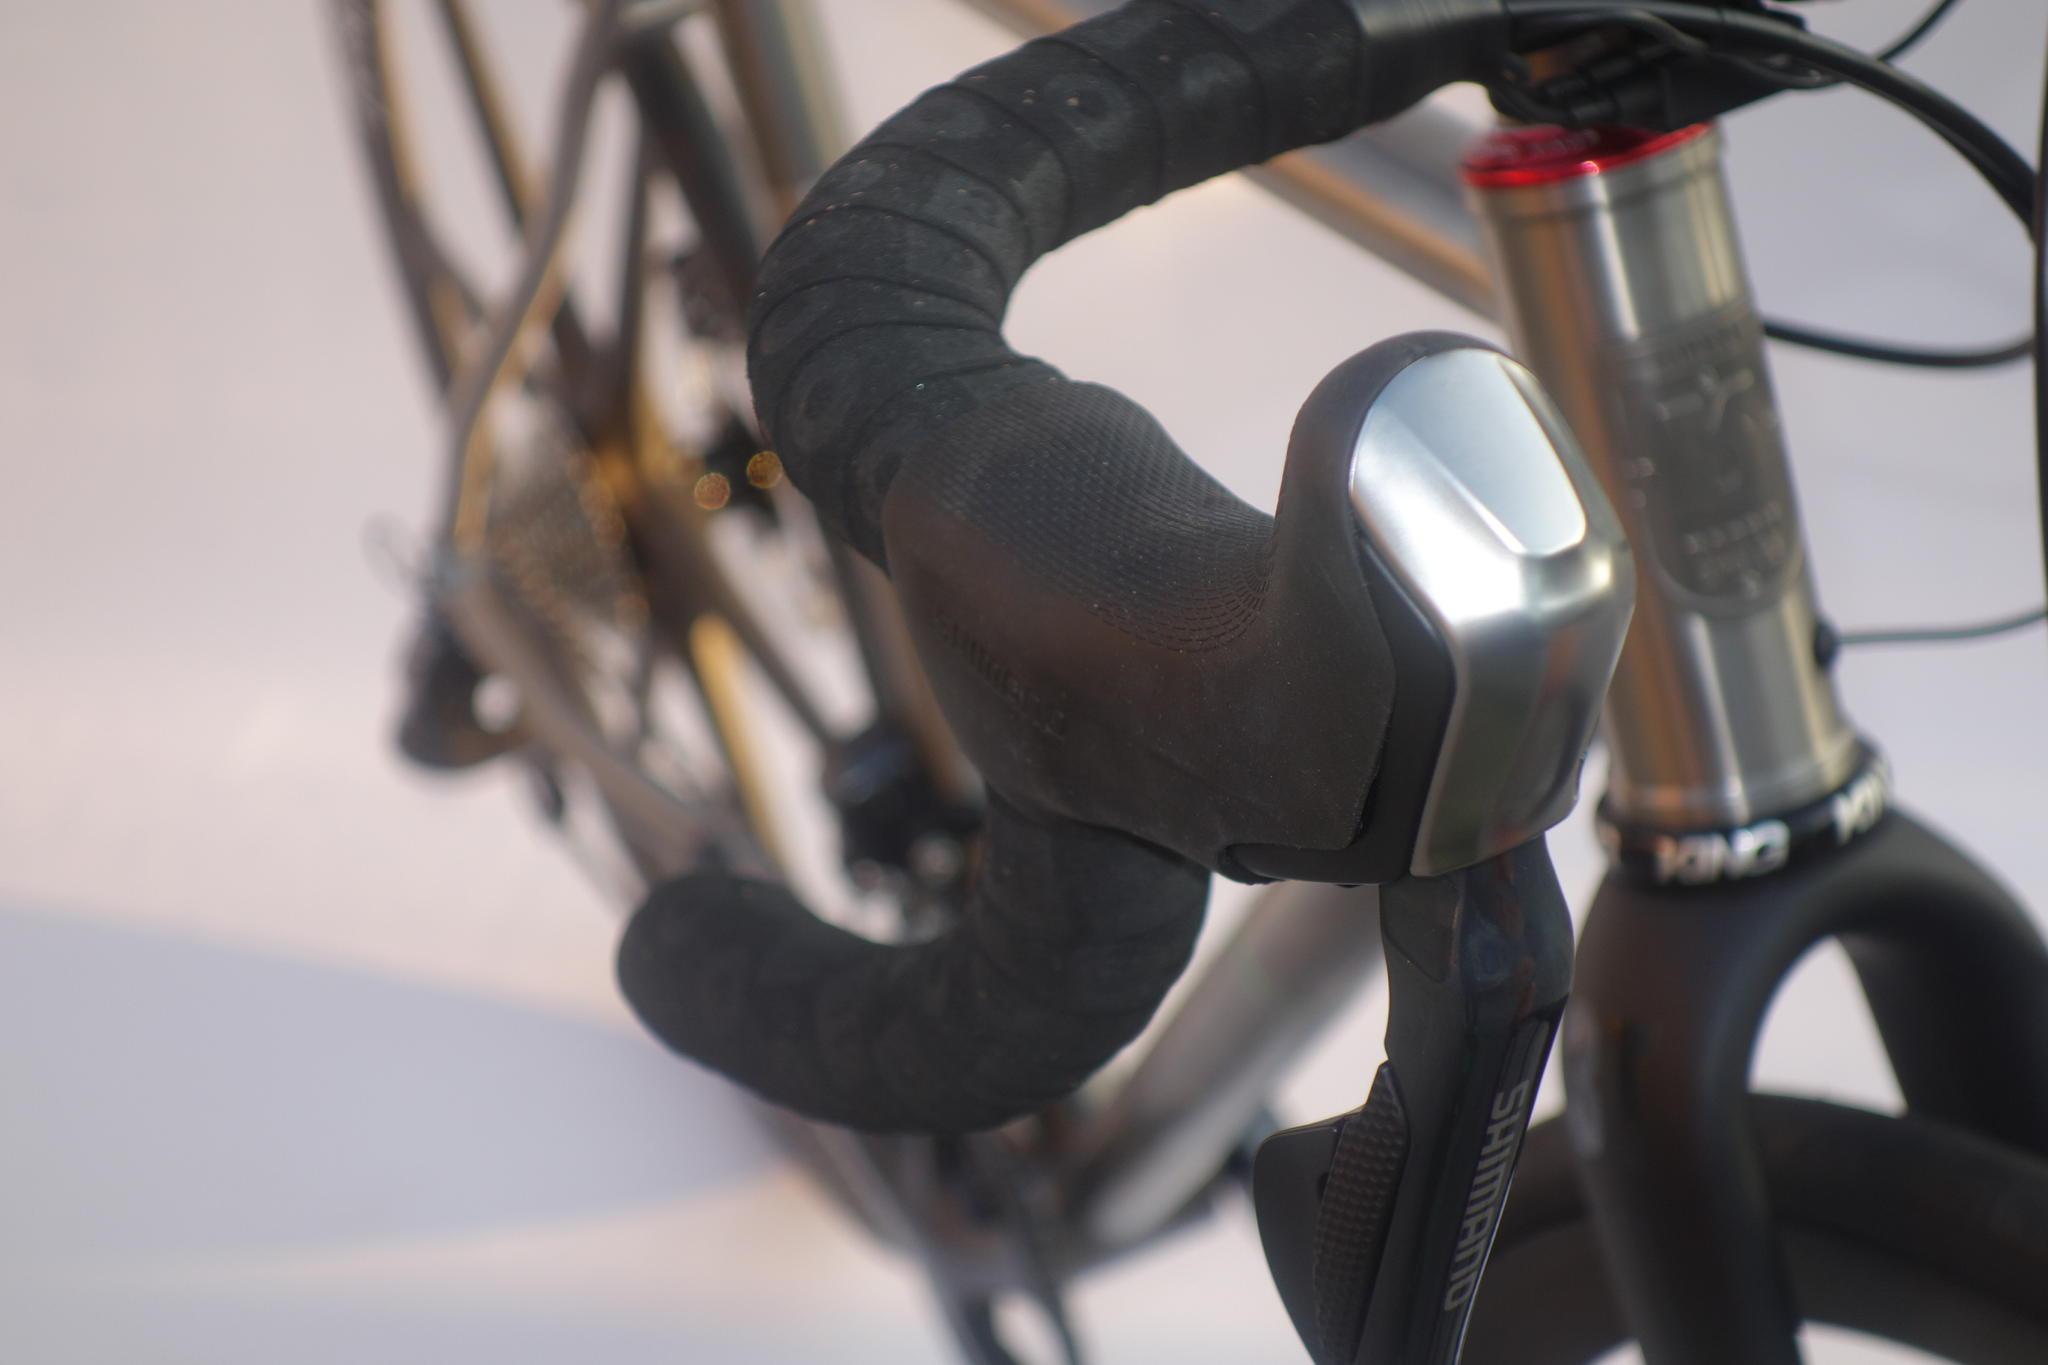 rabbit_cycles_titan_road_disc_dsc03495